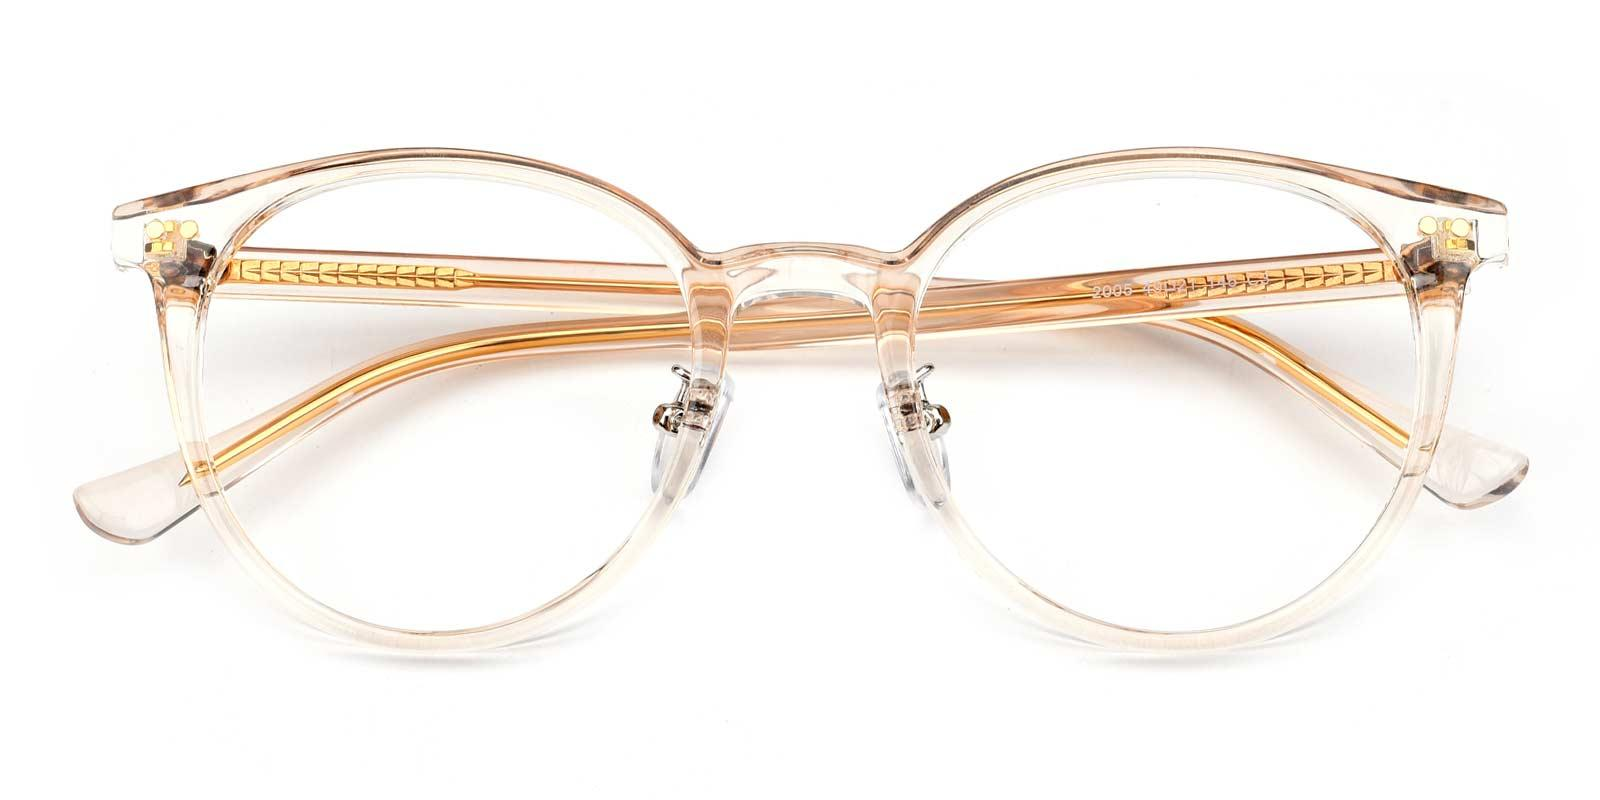 Adonia-Orange-Round-Combination-Eyeglasses-detail